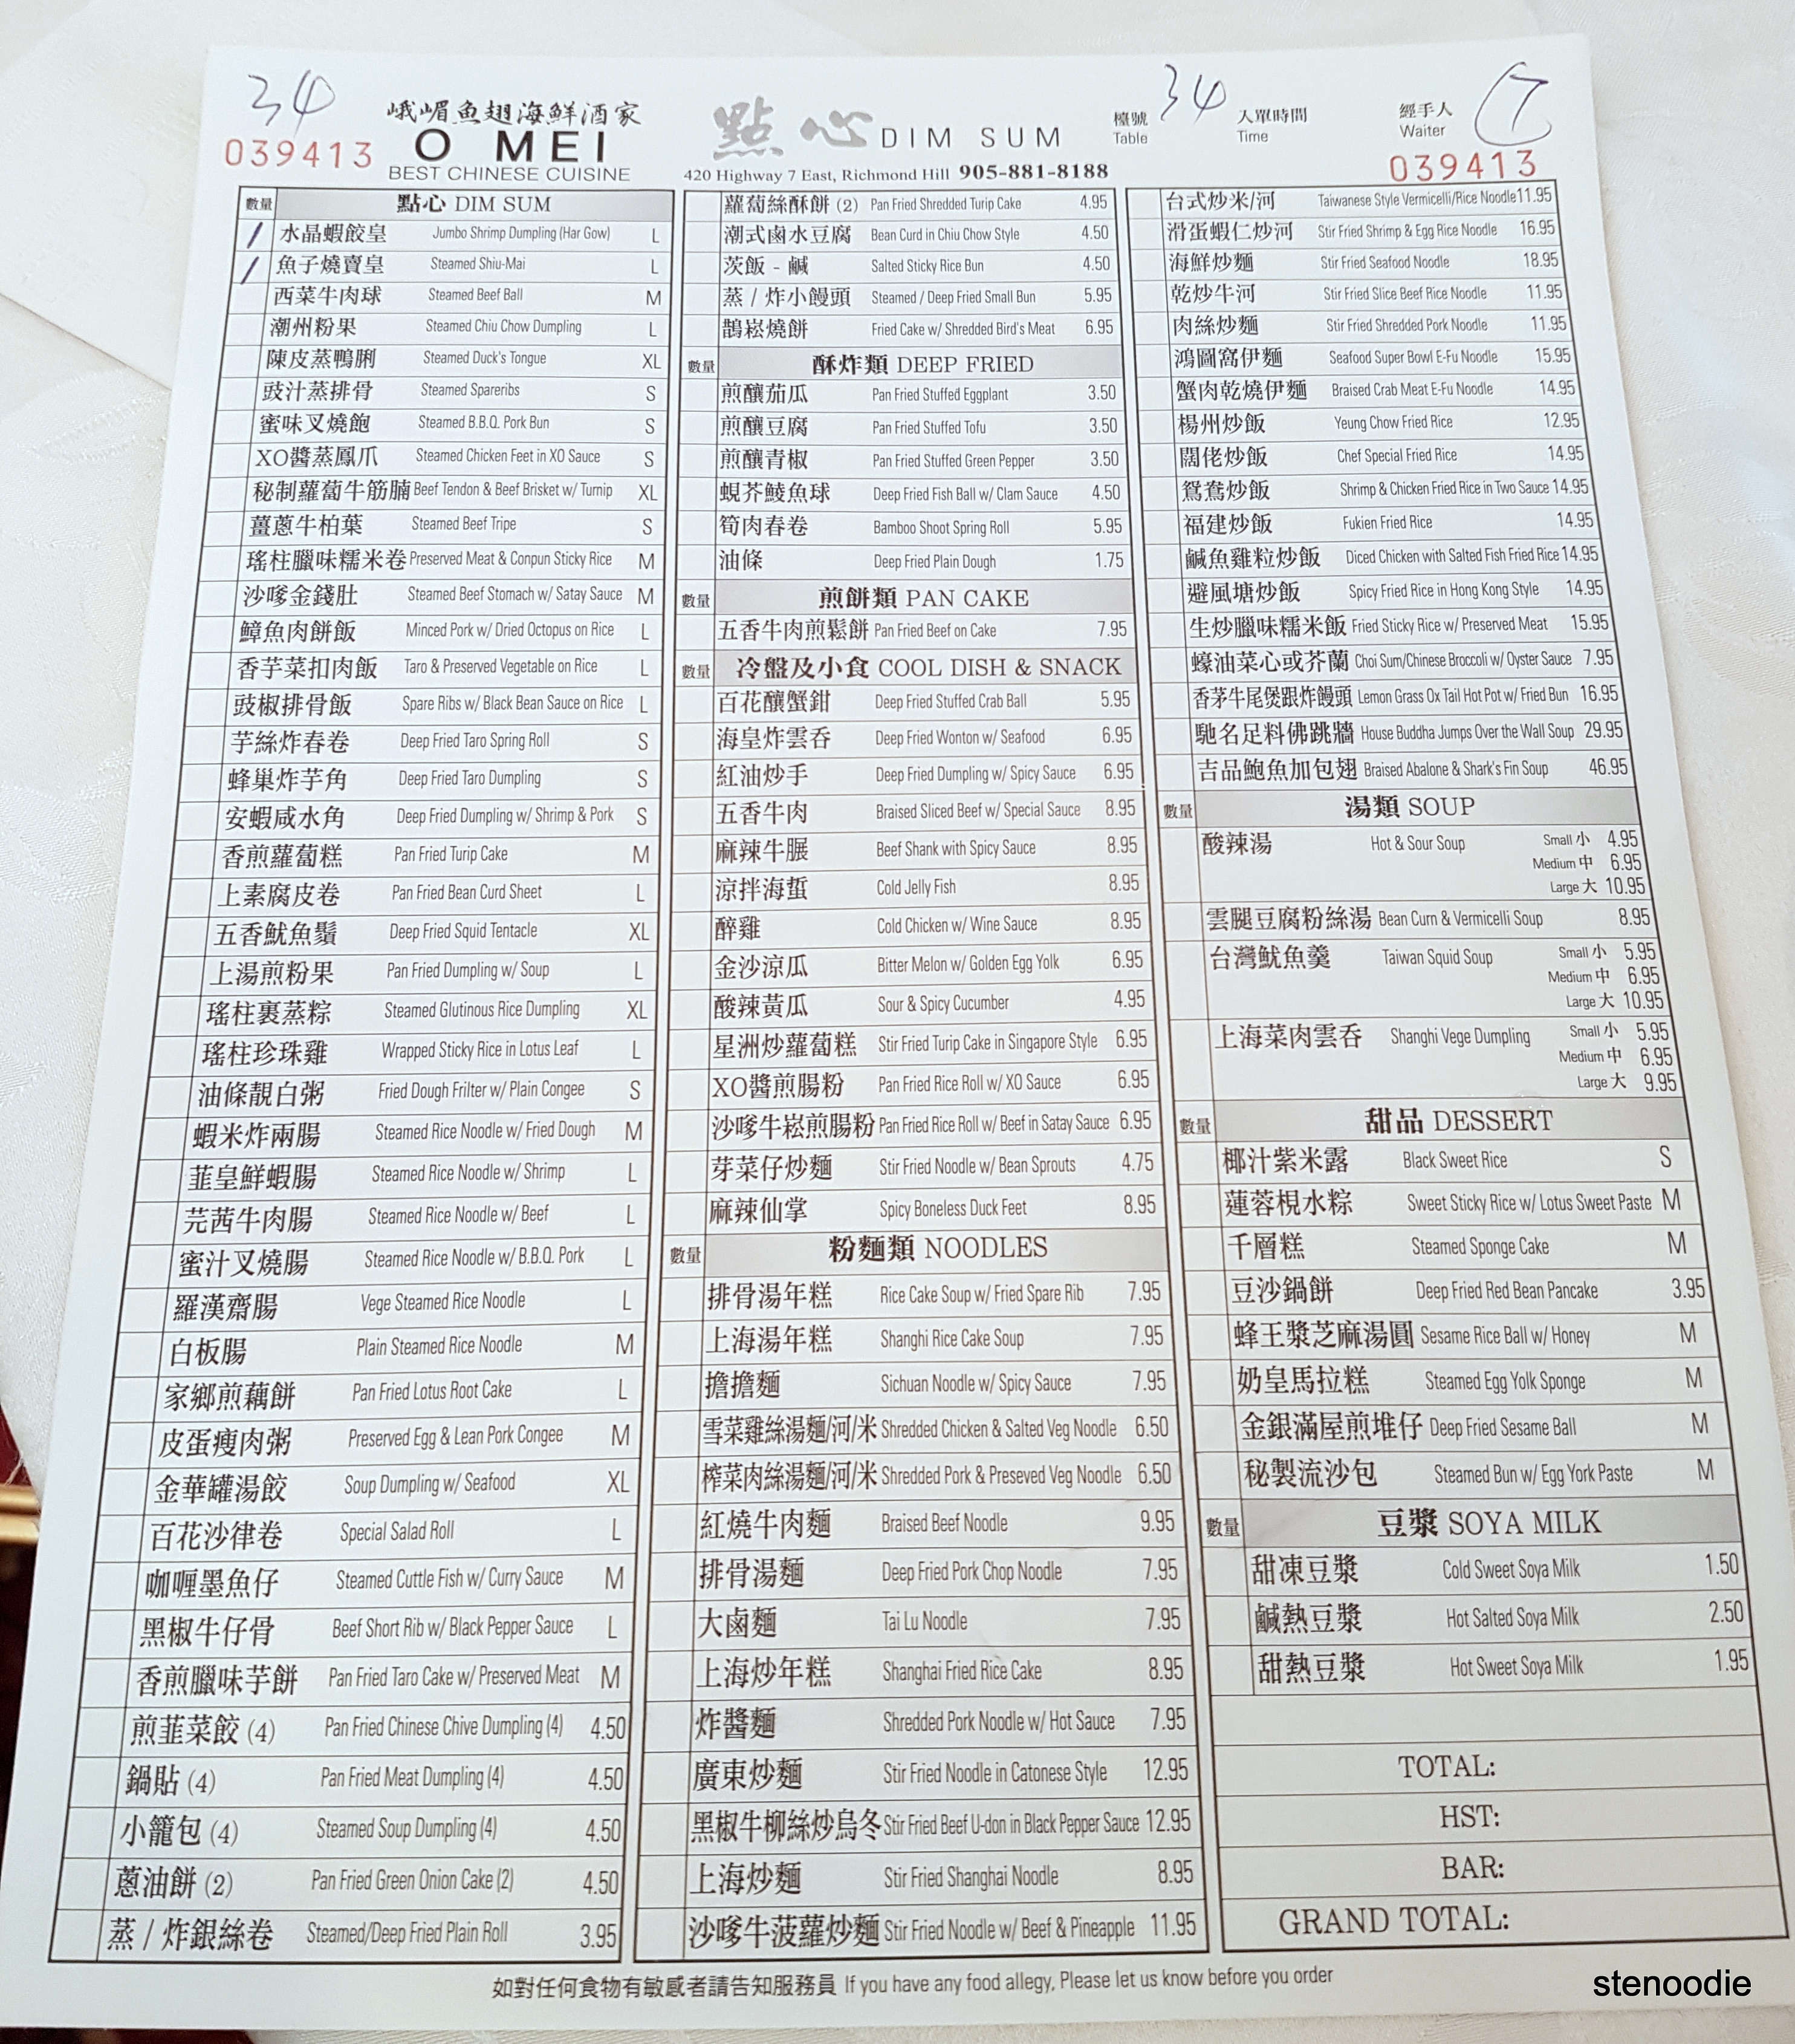 Omei Restaurant dim sum order sheet